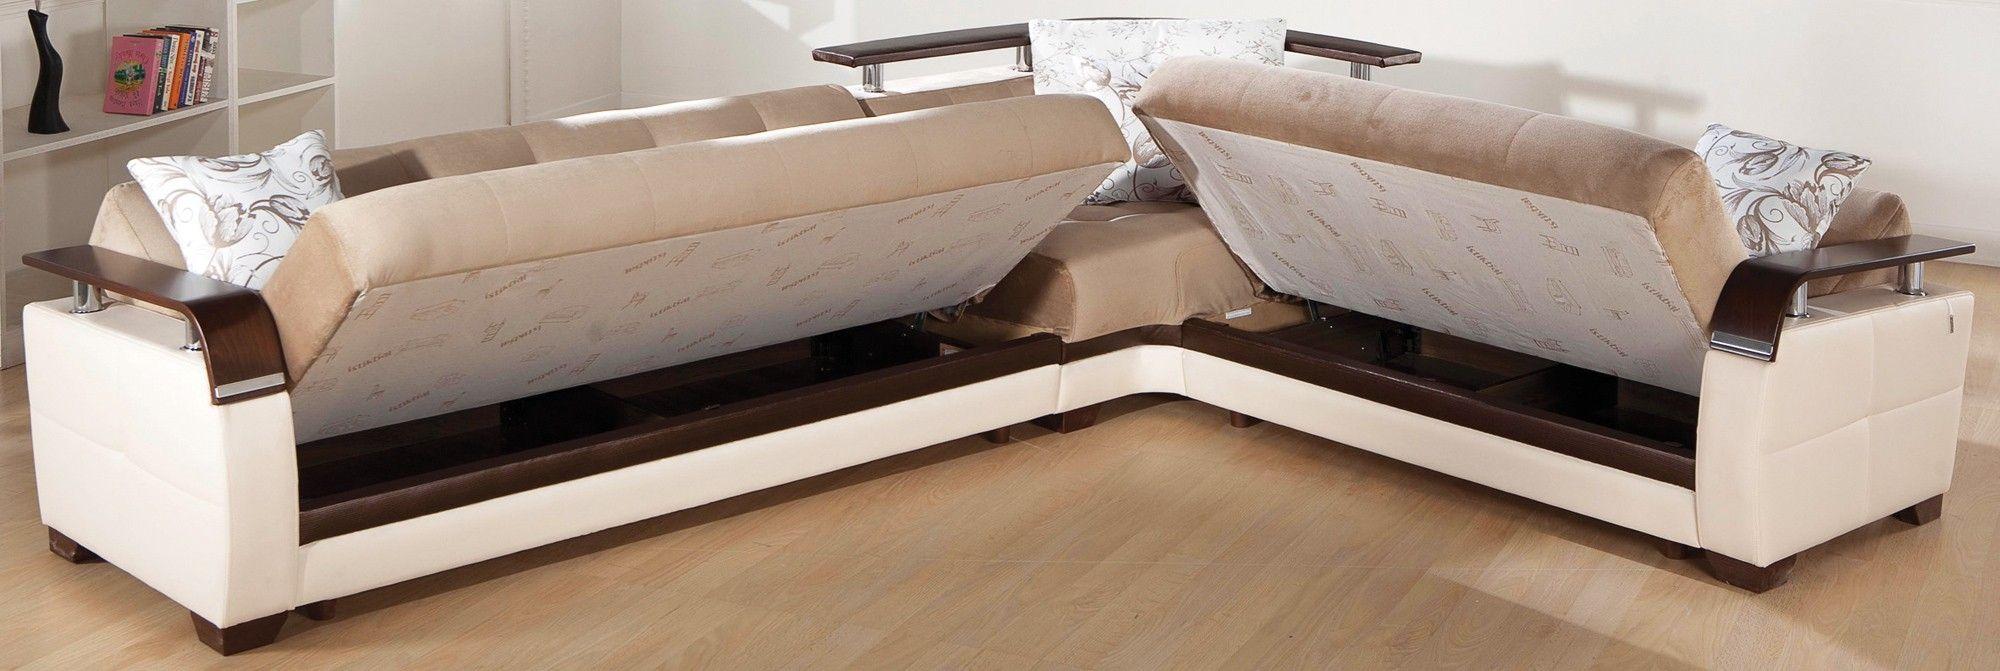 european sleeper sofa bed http tmidb com pinterest sleeper rh pinterest com european style sleeper sofa with storage European Sofa Bed with Storage